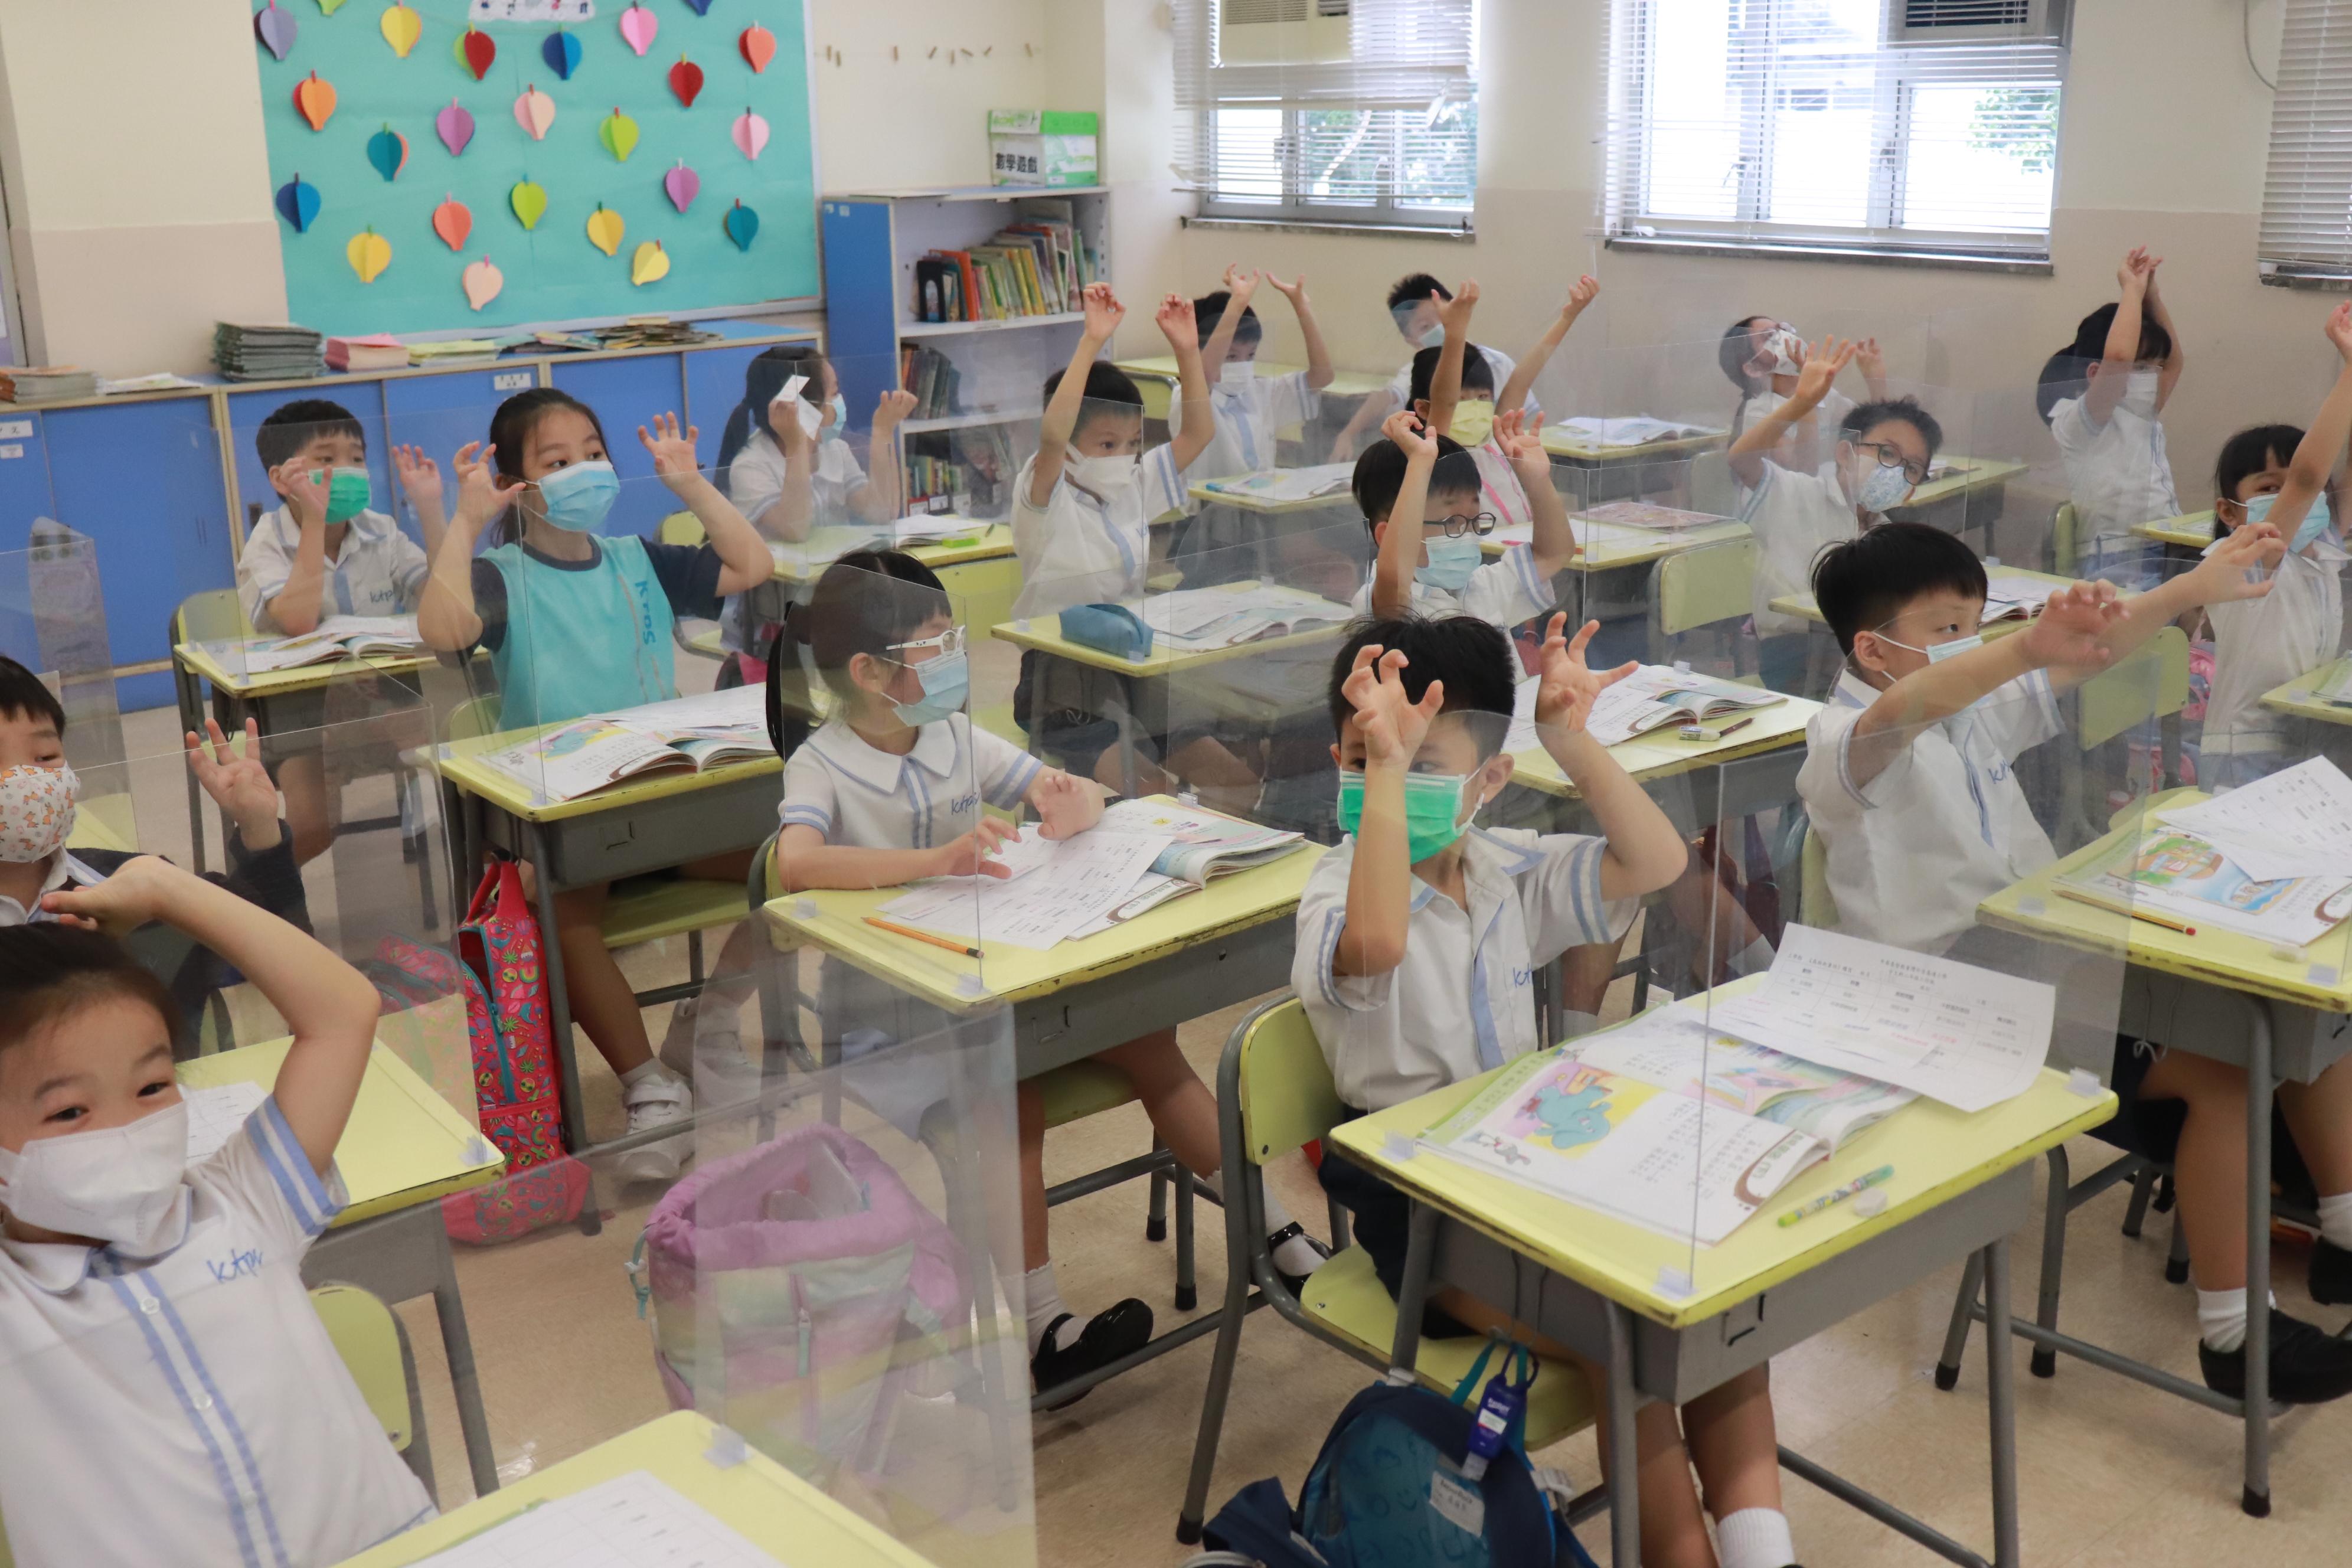 http://keito.school.hk/sites/default/files/img_6510.jpg